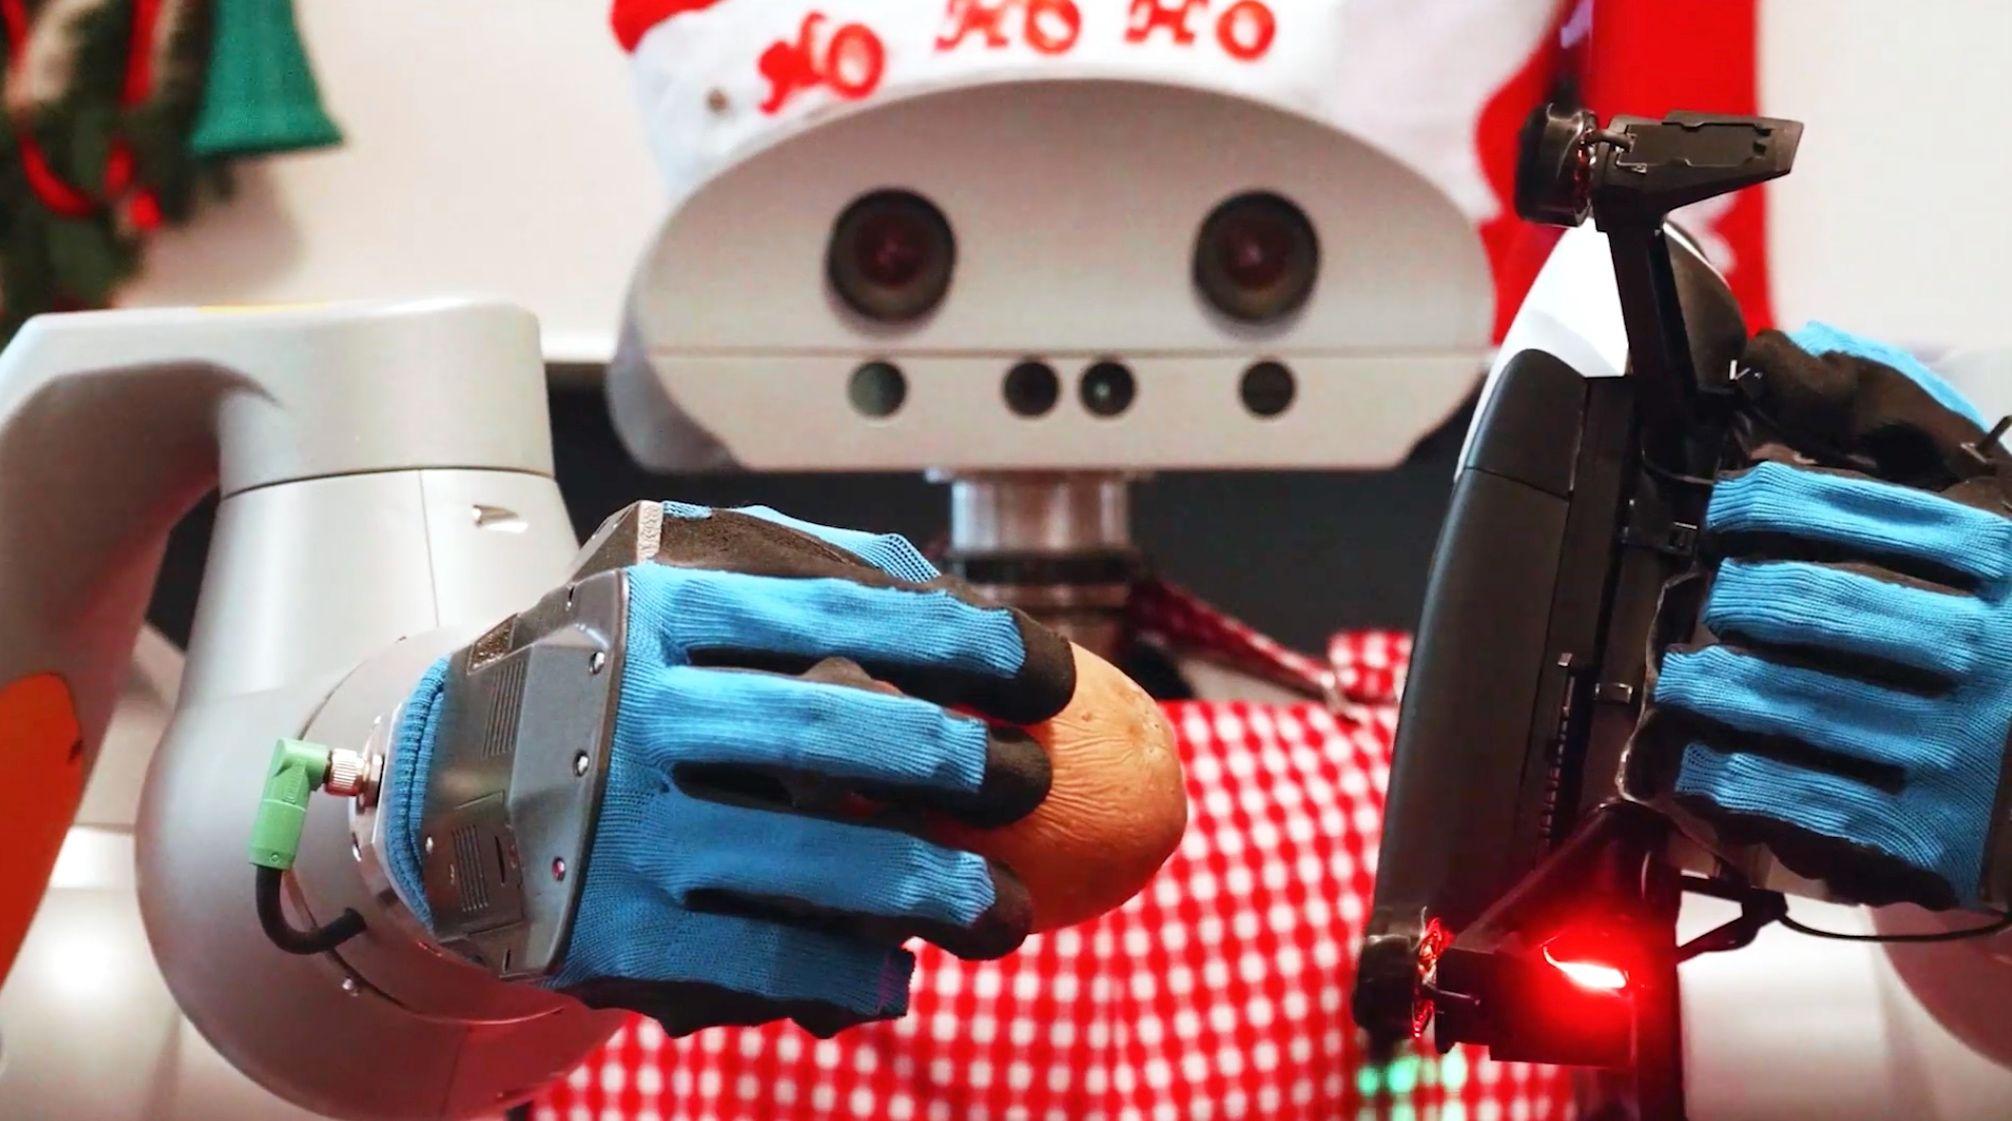 FZI happy holidays from robots